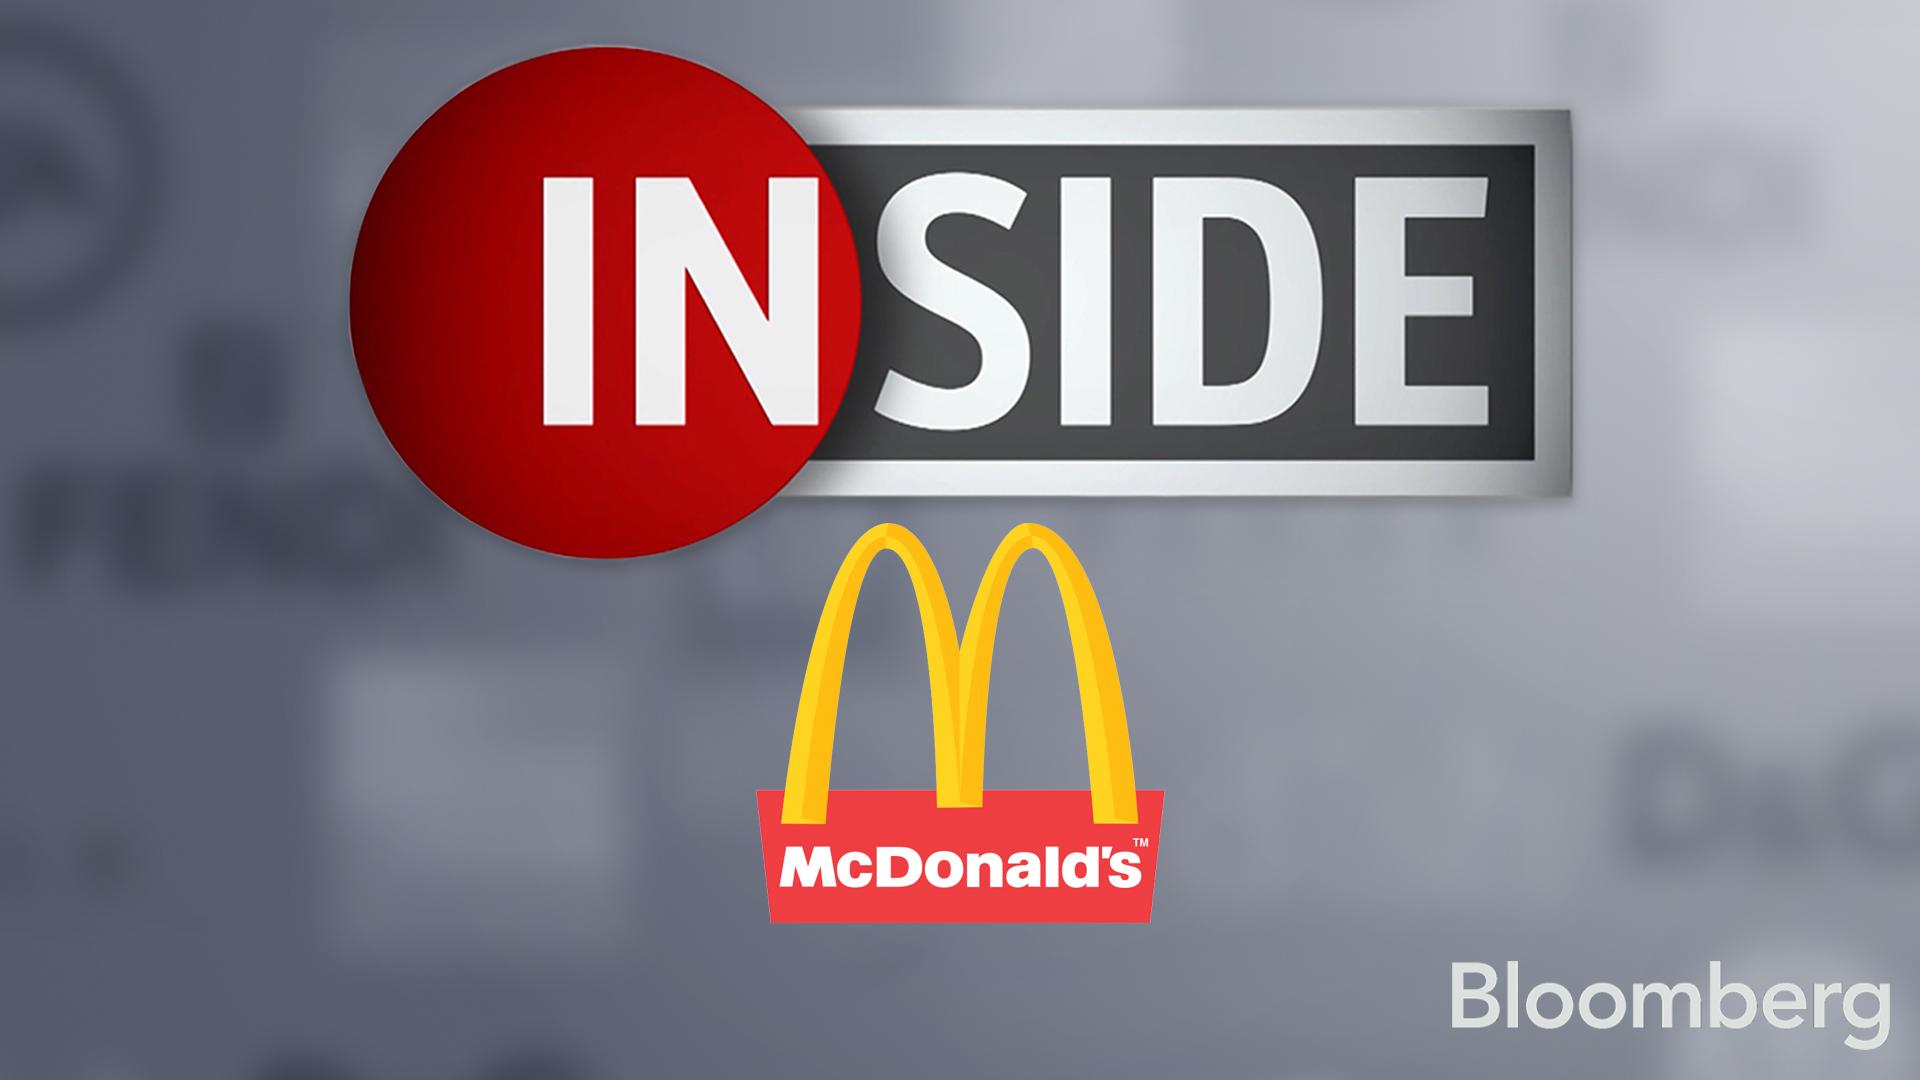 Bloomberg Inside: McDonald's